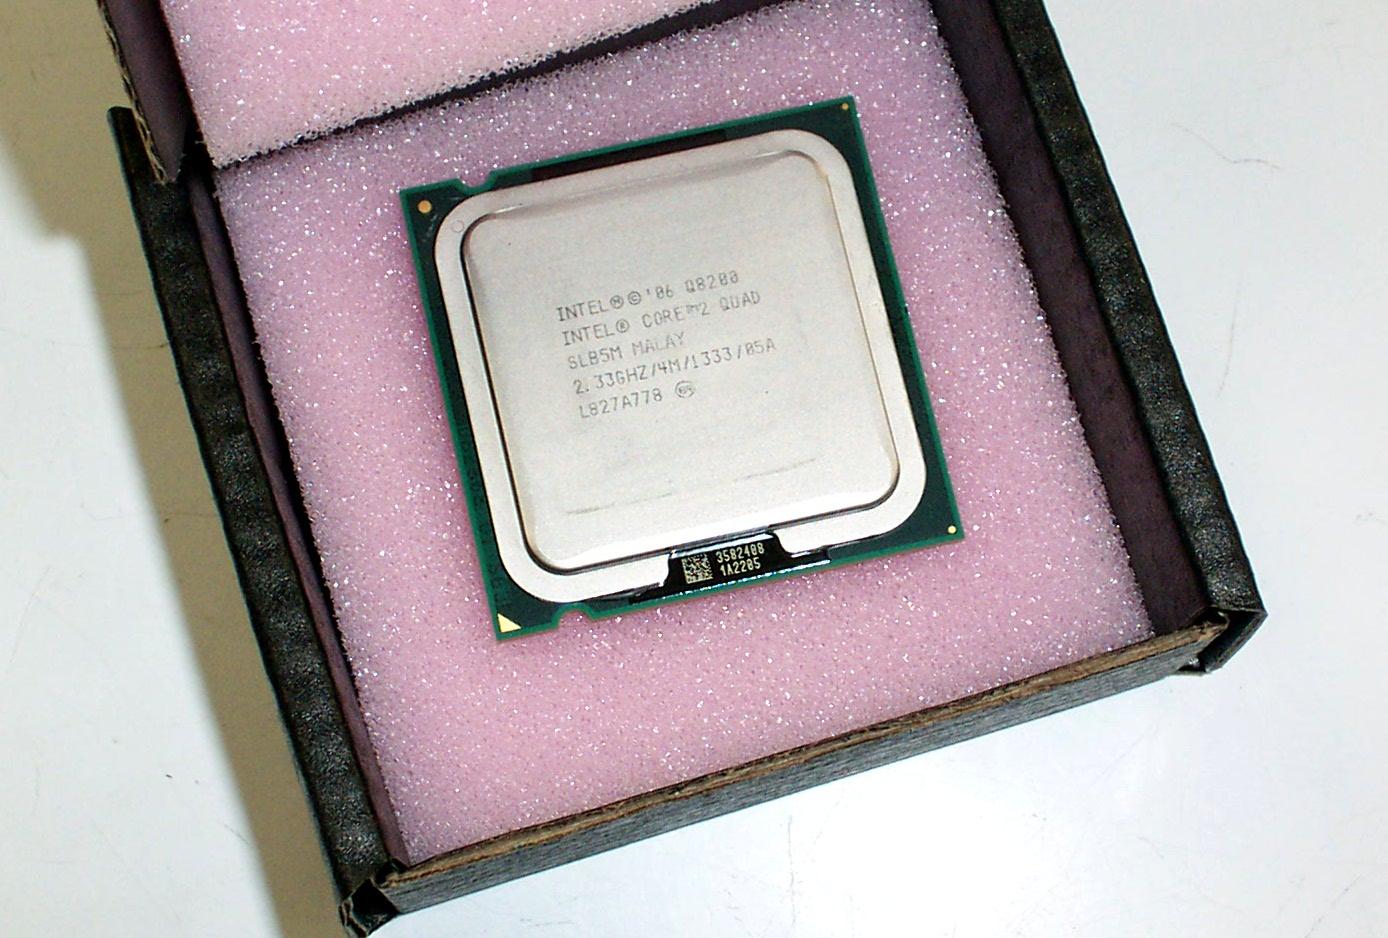 SLB5M Intel Core 2 Quad Core Q8200 2.33GHz / 4M / 1333 / 05A LGA 775 Processor